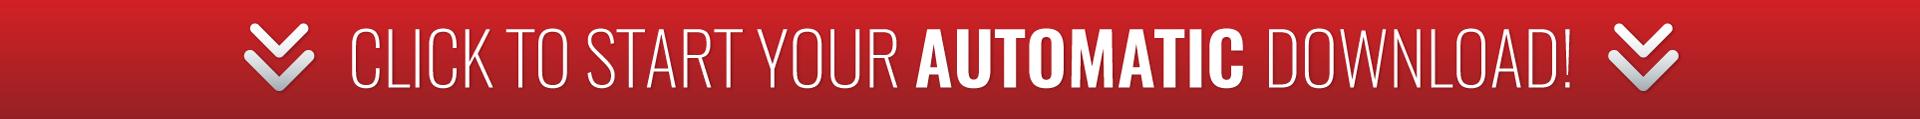 auto-download-btn